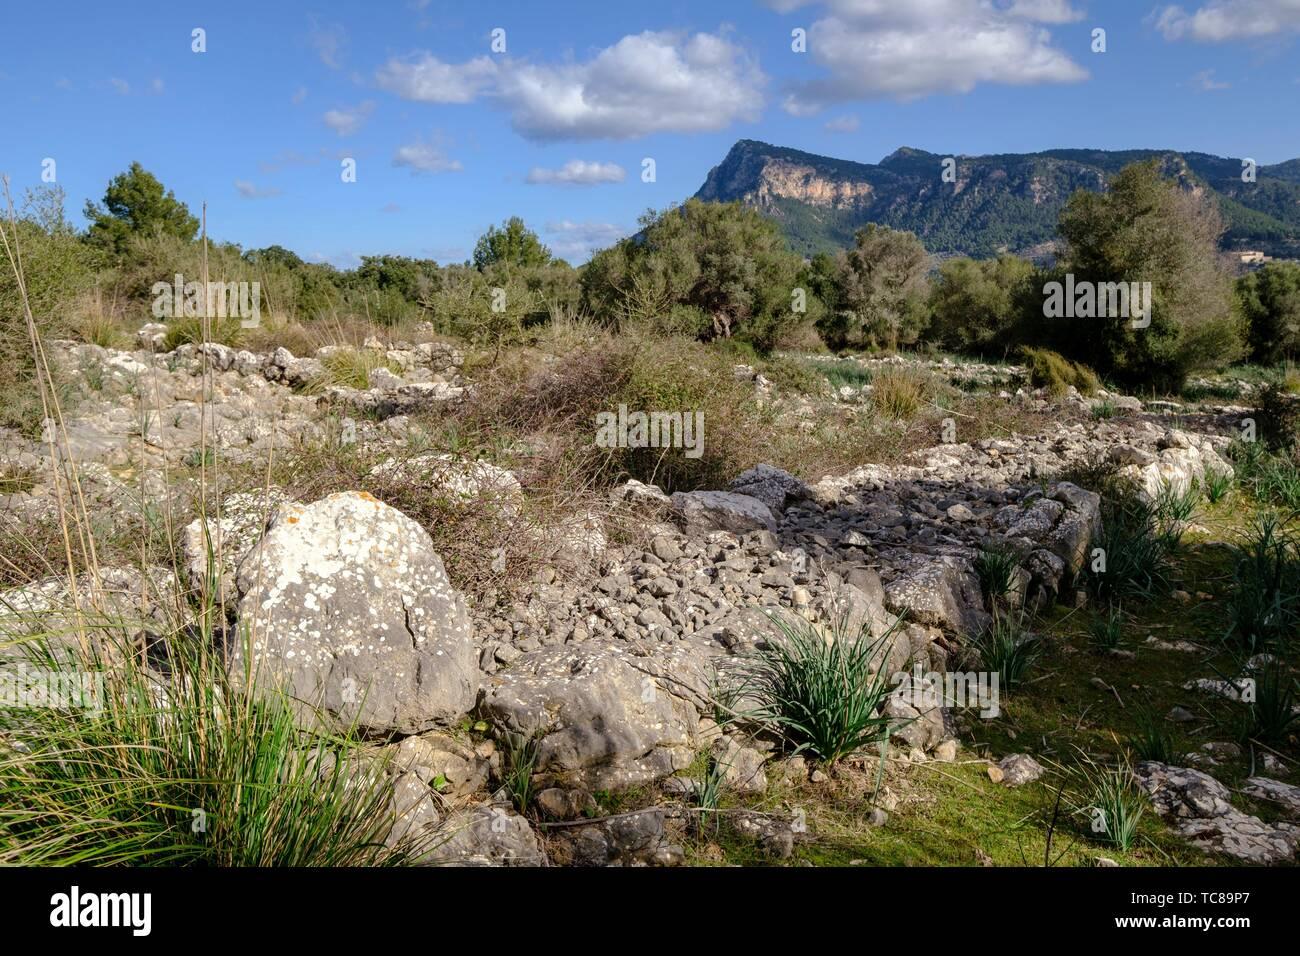 recinto pretalayótico, Son Ferrandell-Son Oleza, I milenio a C. , Valldemossa, Mallorca, Balearic islands, spain. - Stock Image